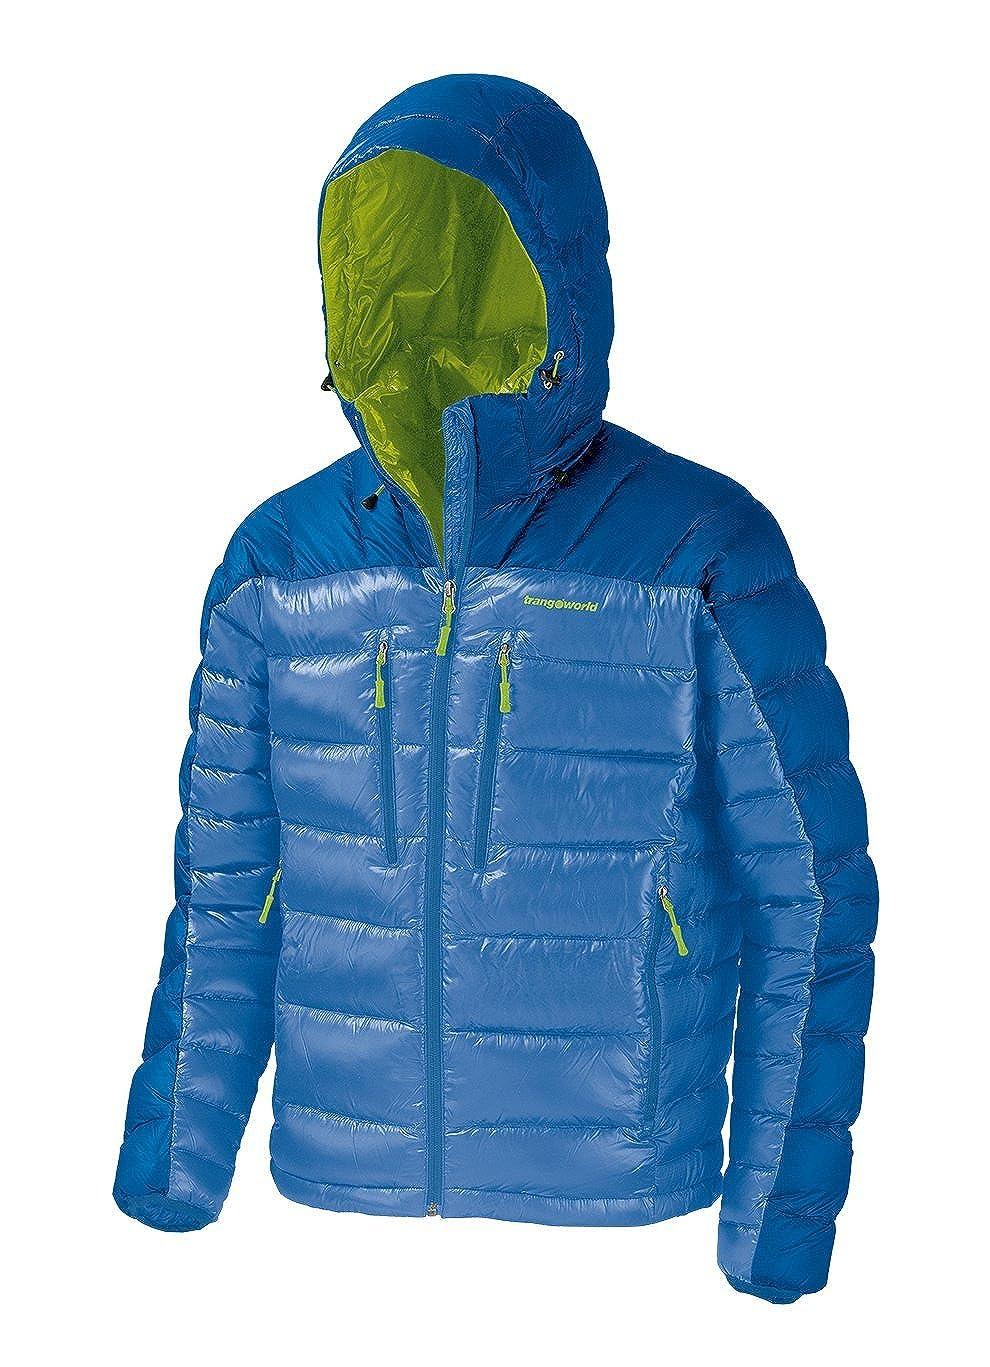 Amazon.com: Trangoworld CHAQUETA AWEL FT: Clothing